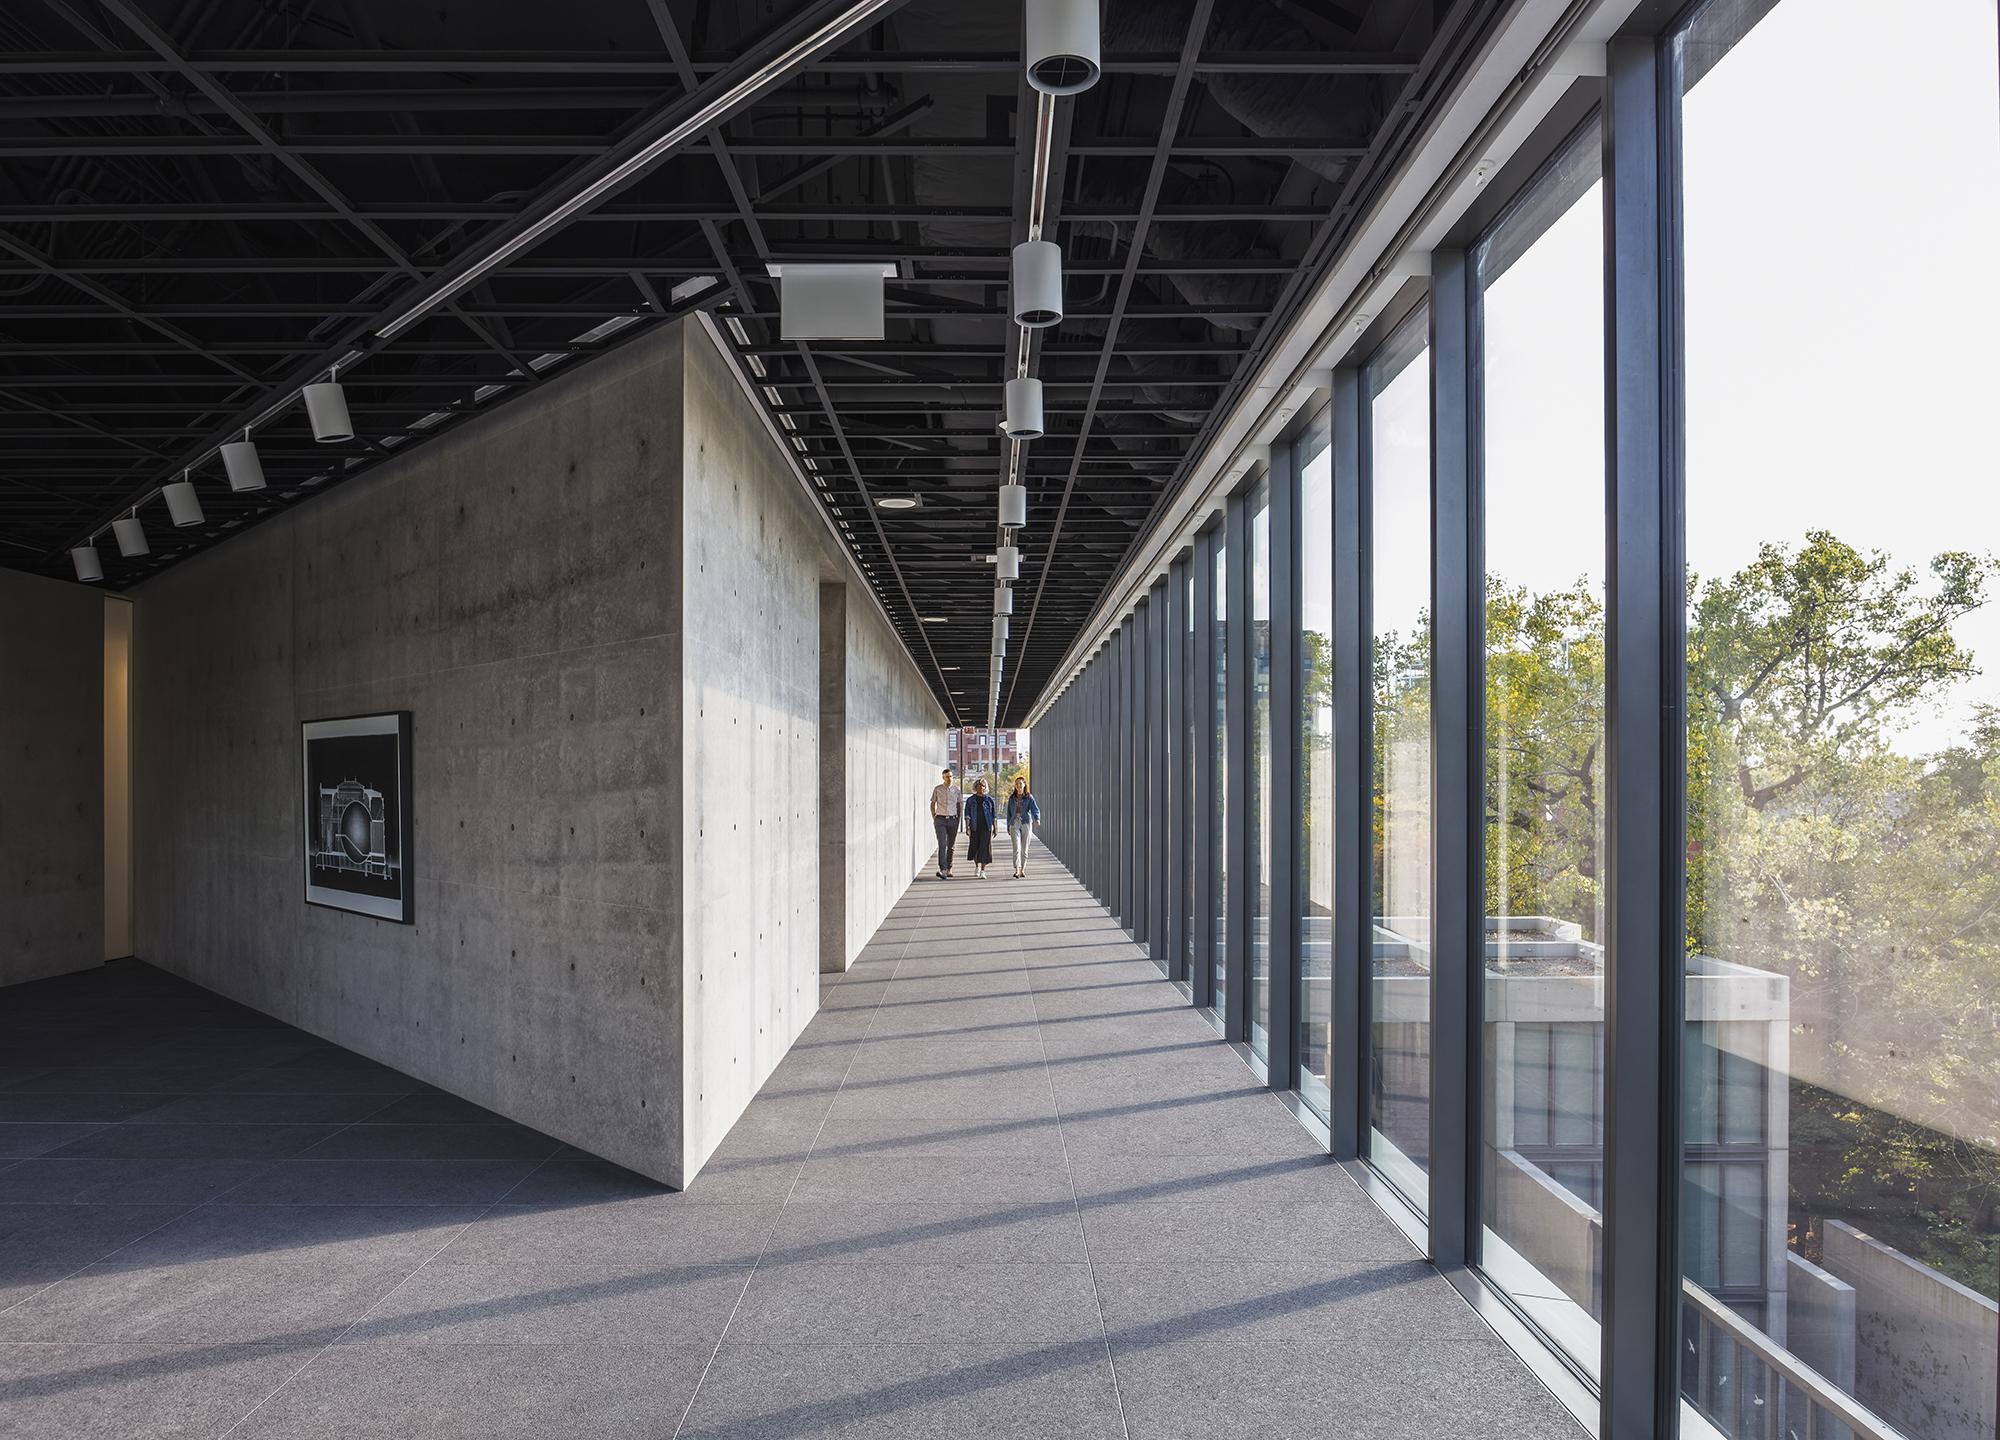 Wrightwood 659, Location: Chicago, Illinois, Architect: Tadao An